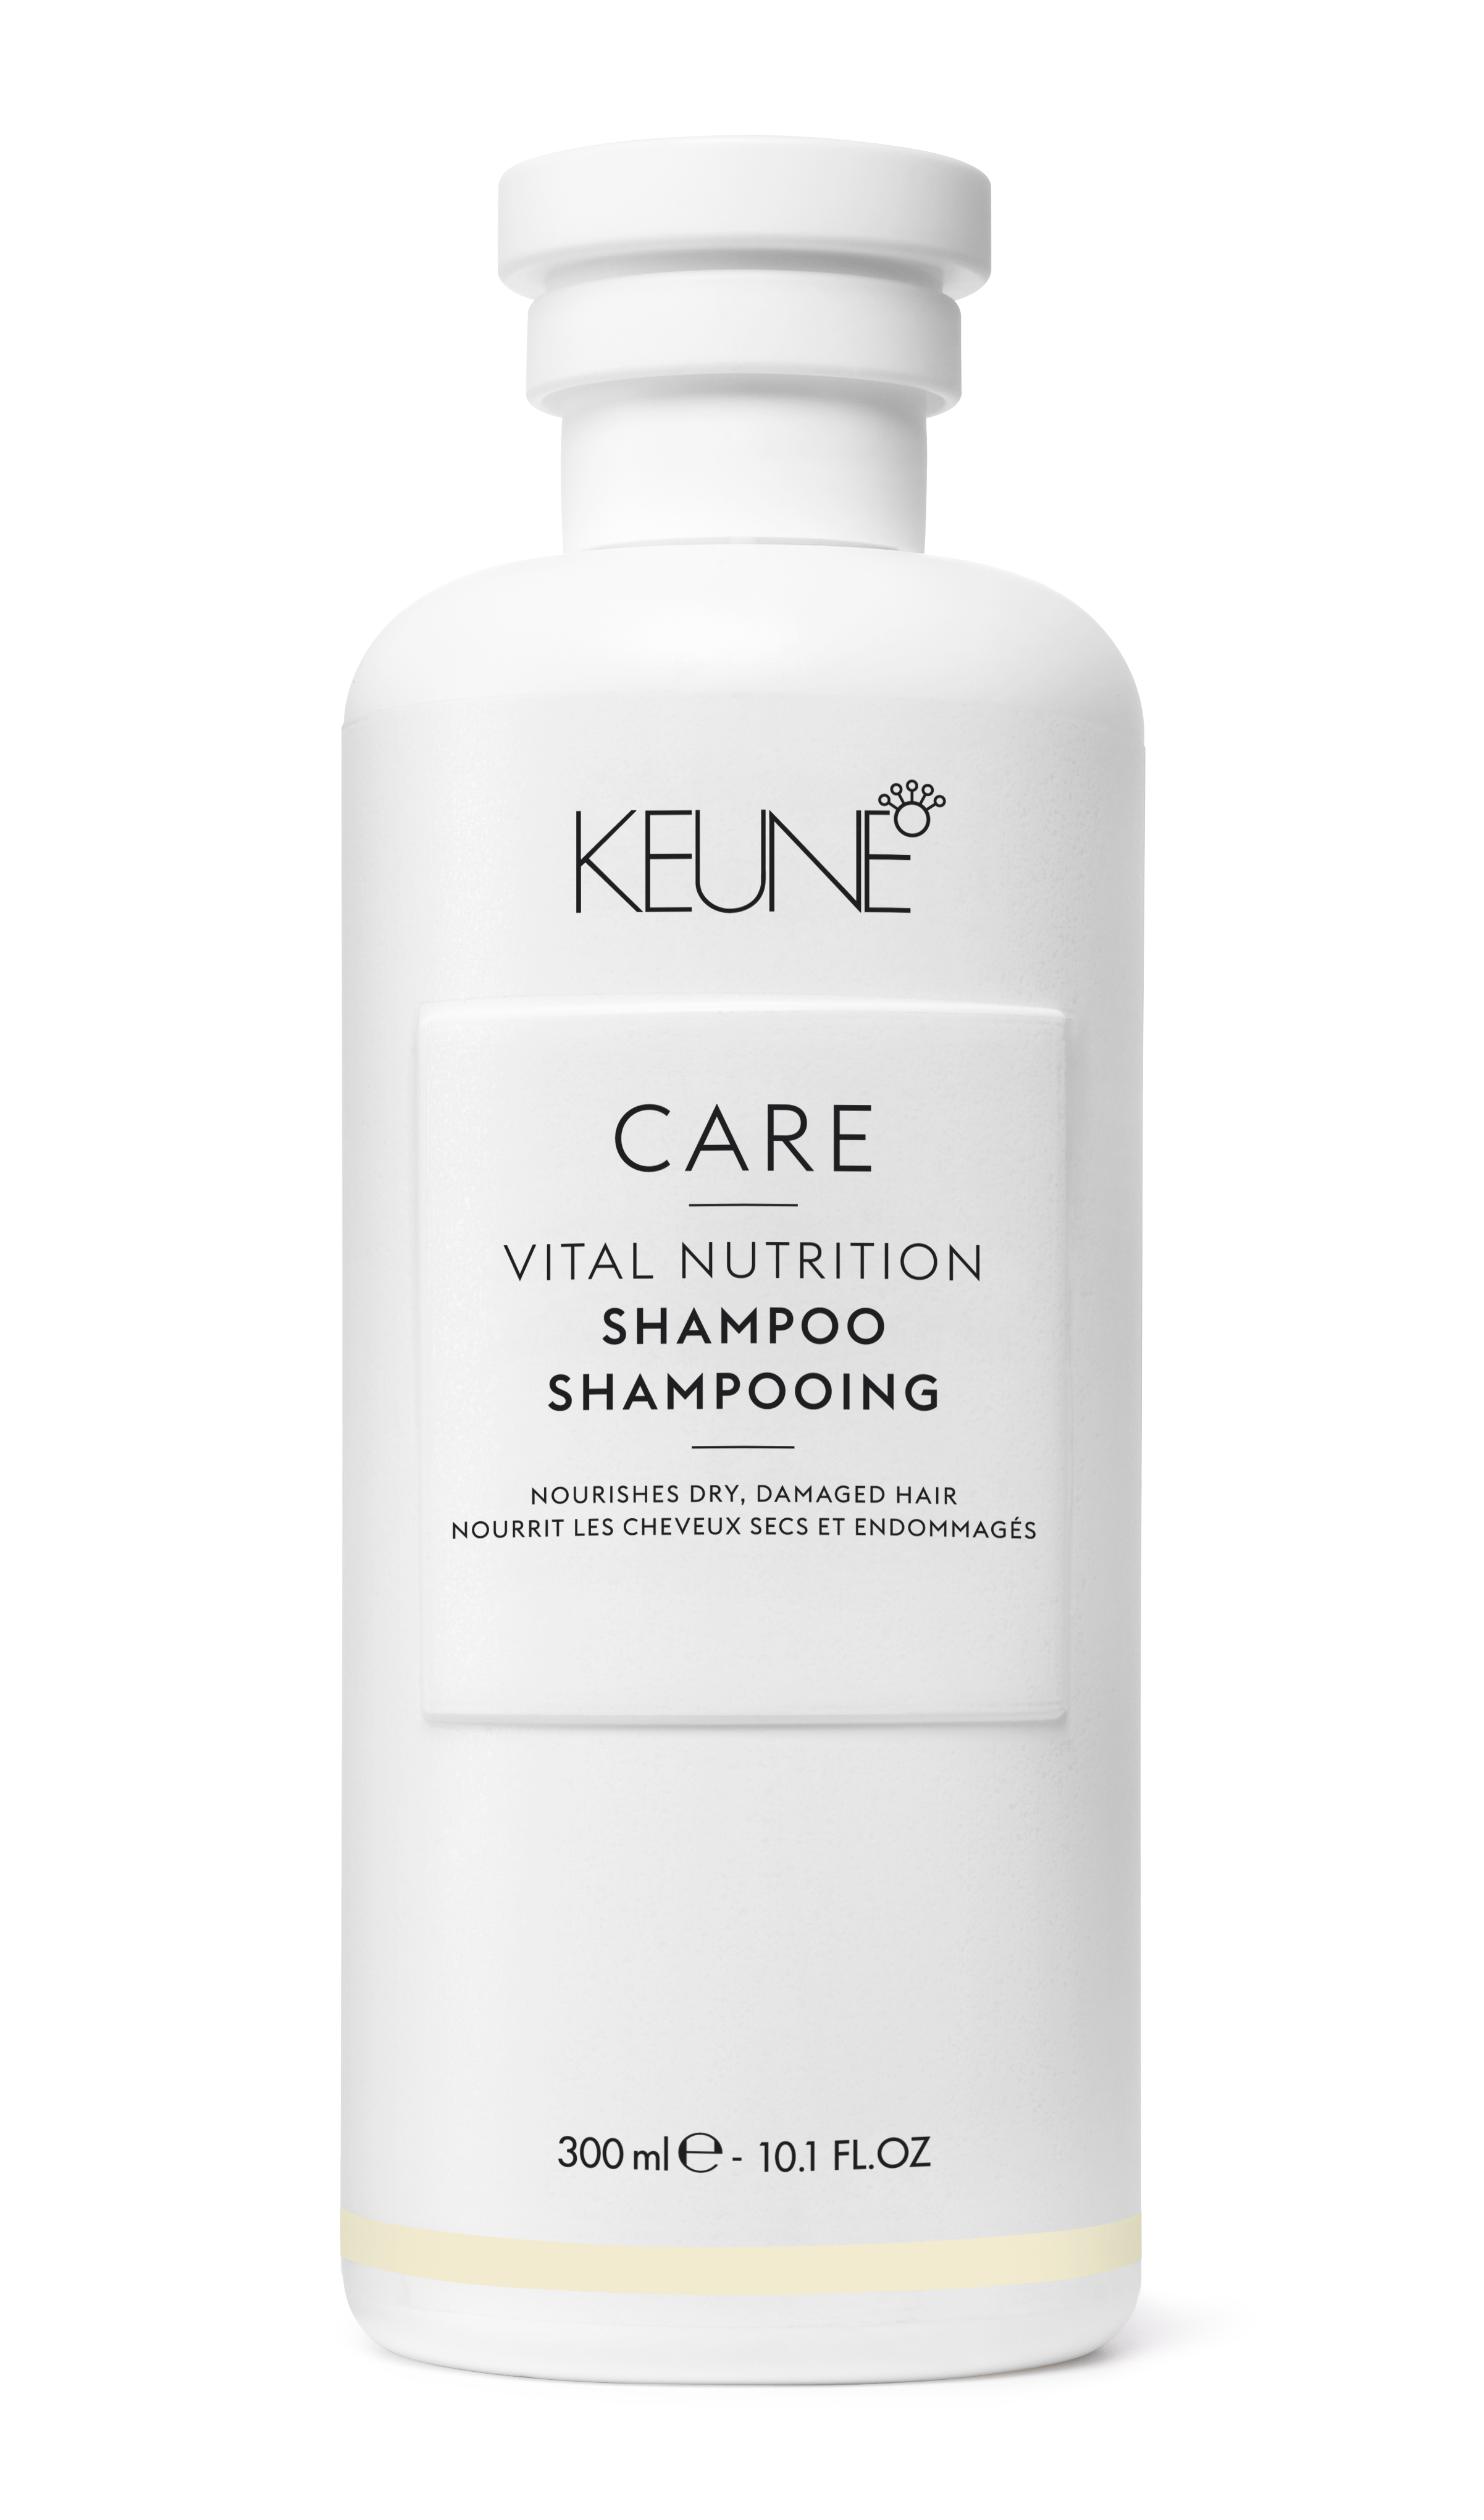 KEUNE Шампунь Основное питание/ CARE Vital Nutrition Shampoo 300мл